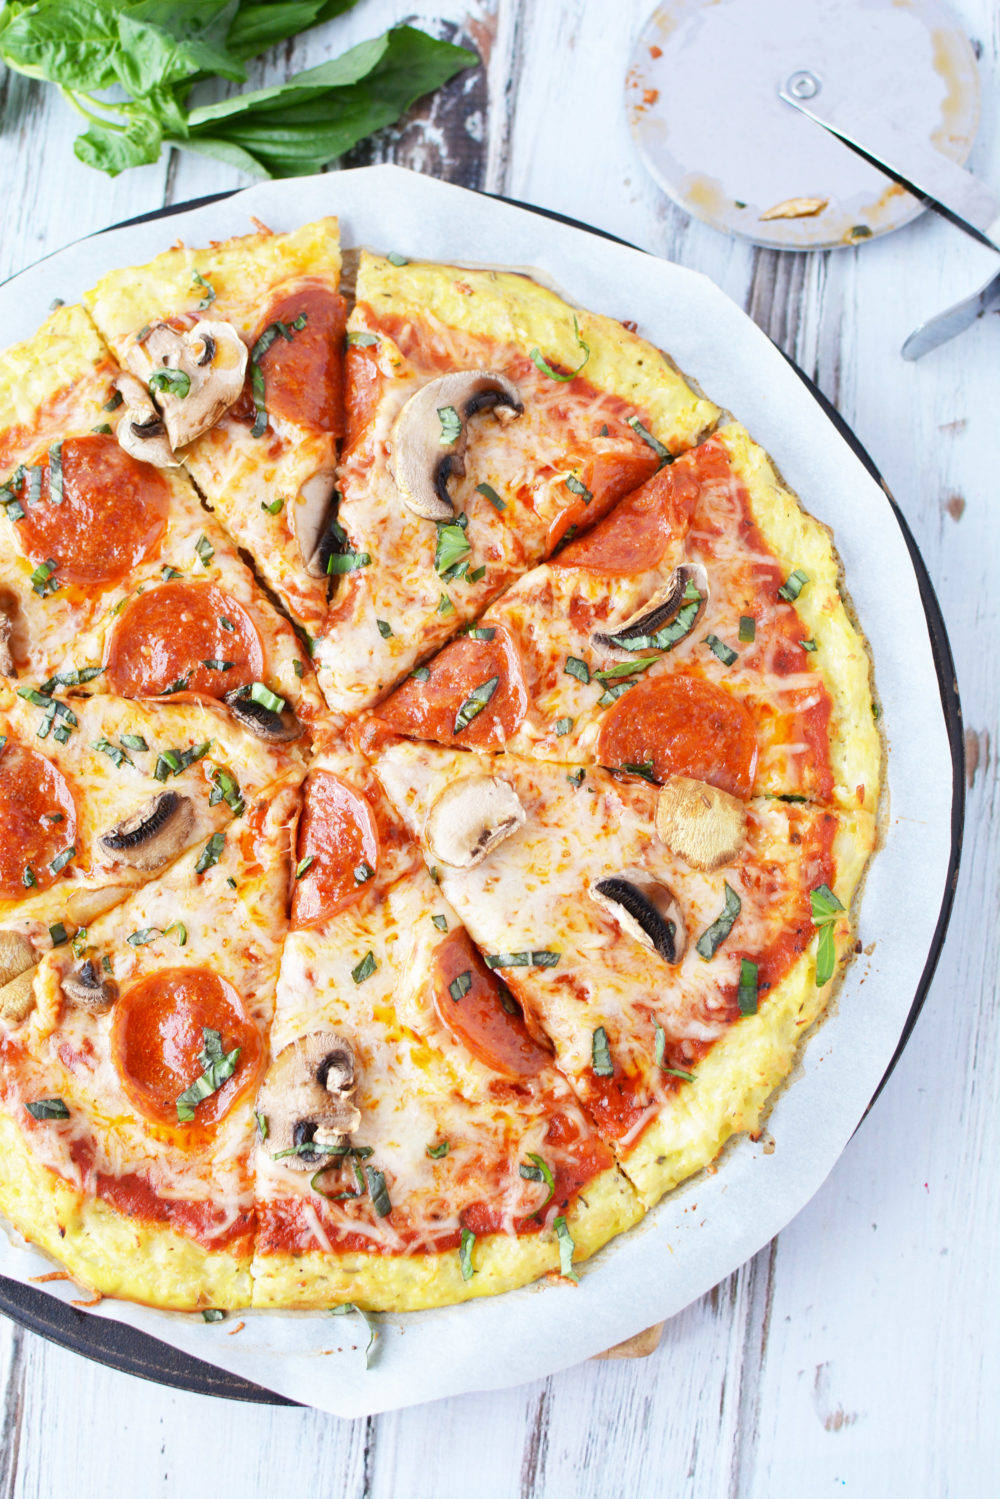 make your favorite pizza using this amazing crispy cauliflower pizza crust!